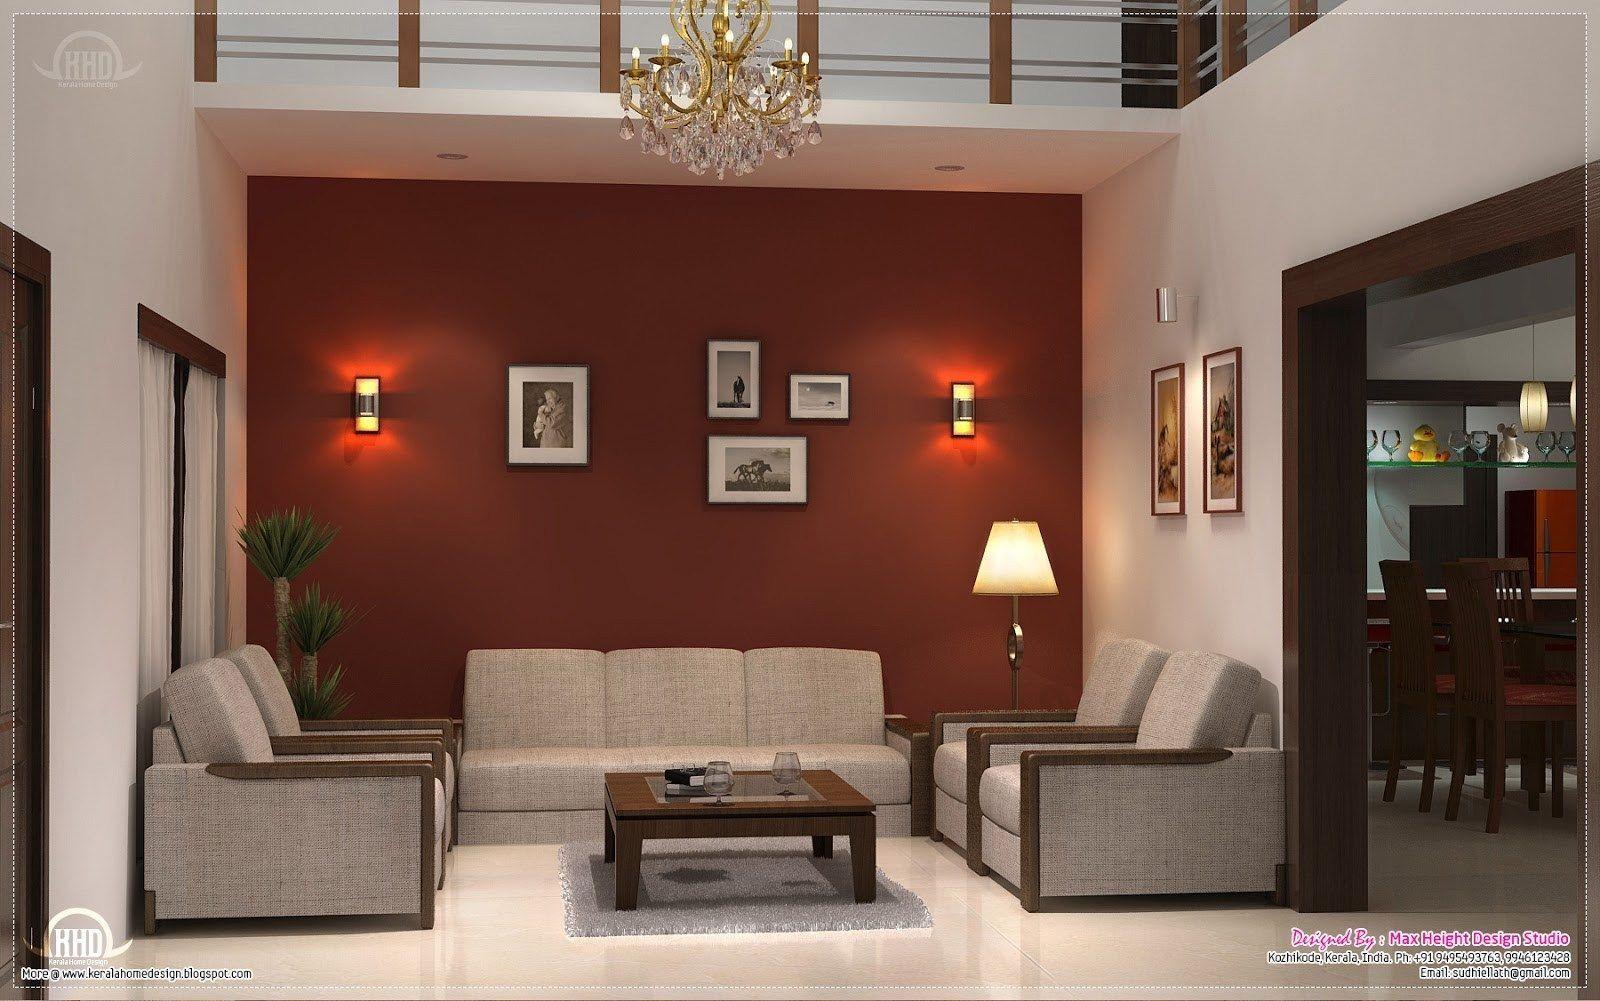 Home Decorating Ideas Middle Class Hall Interior Design Interior Design Living Room Simple Living Room Designs